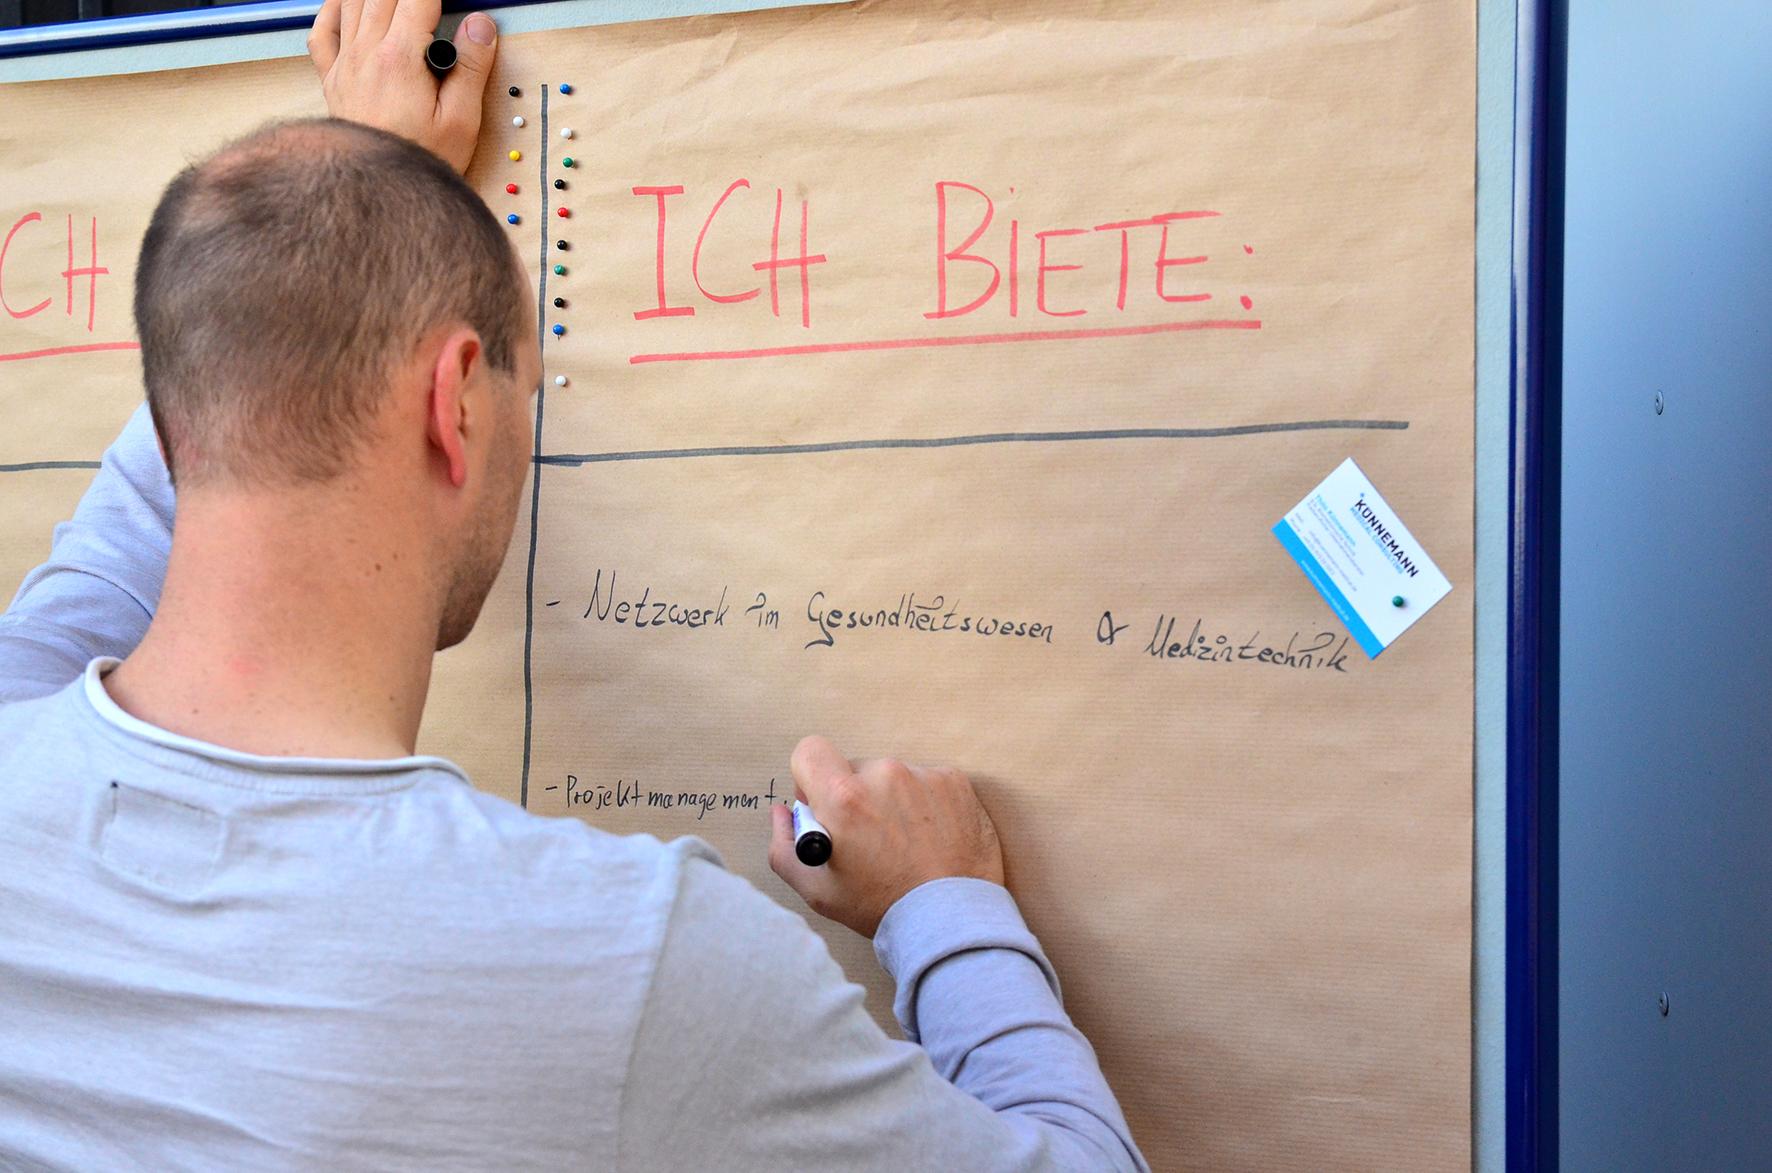 Fotos: FH Münster/ Pressestelle